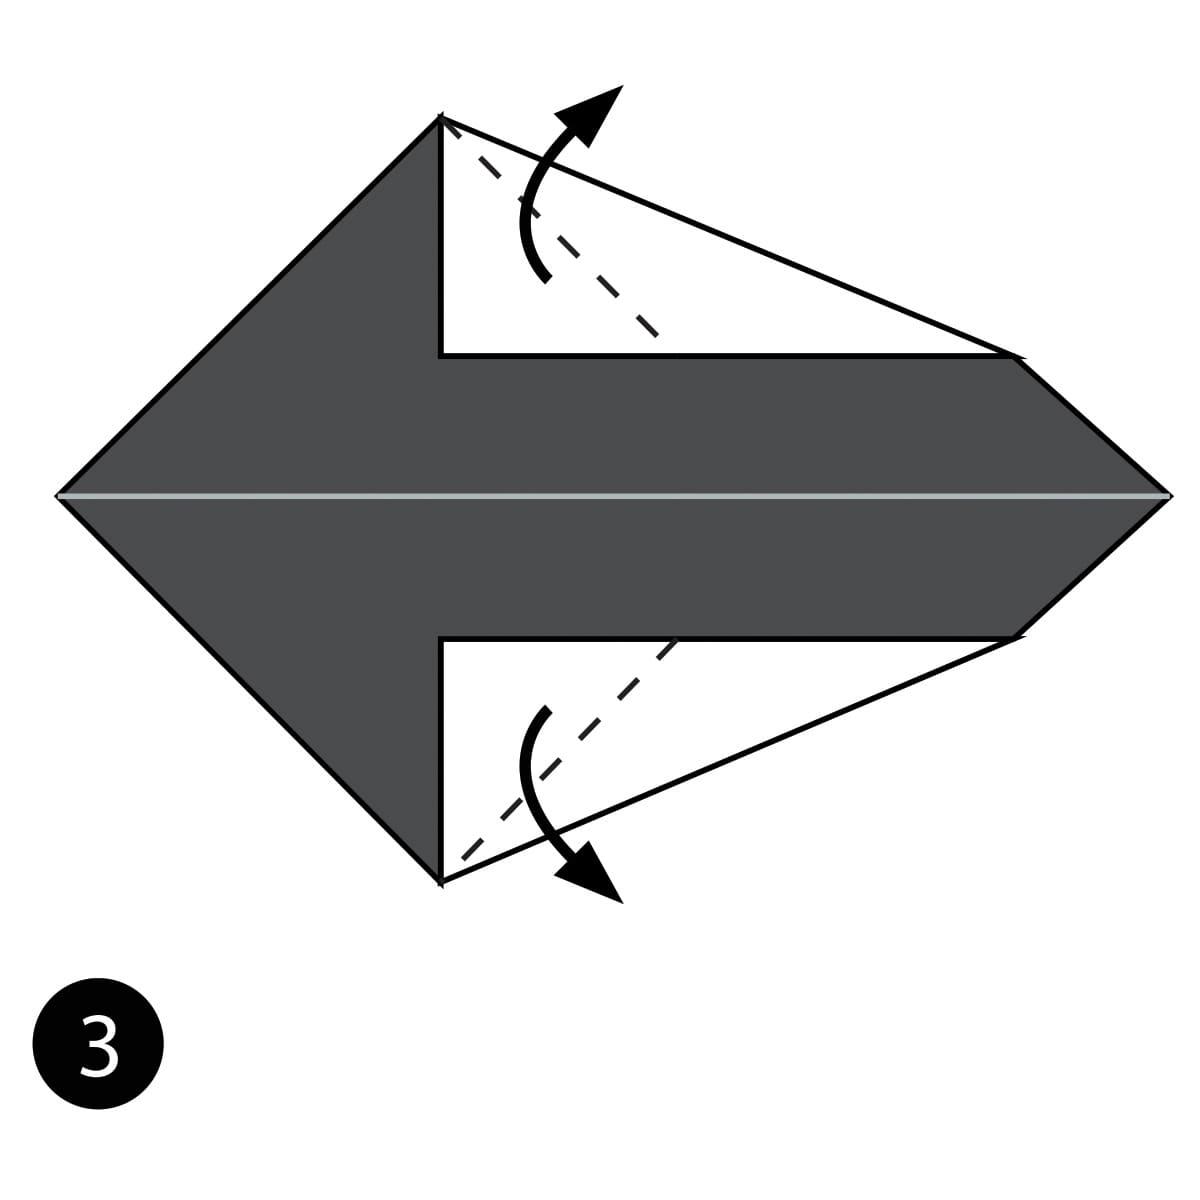 Killer Whale Step 3